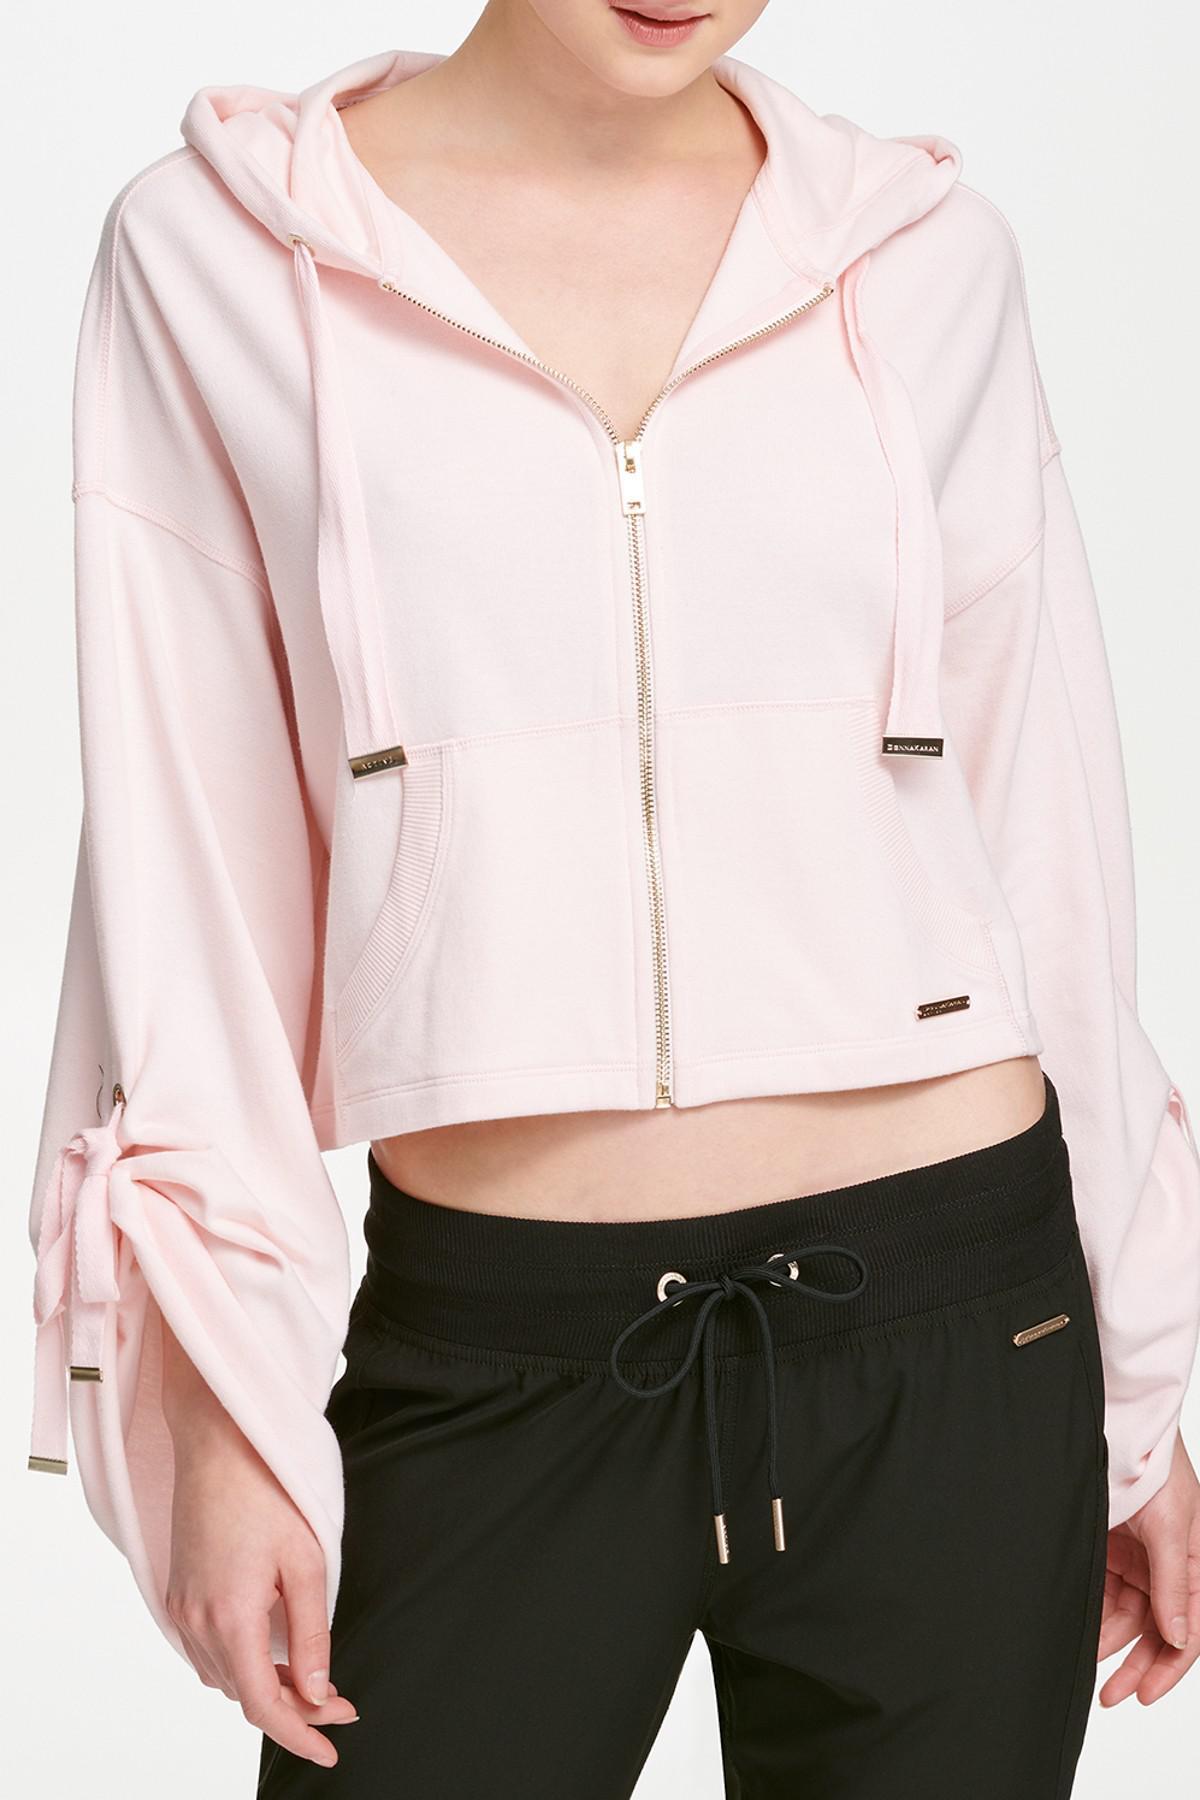 443624df5c9 Lyst - Donna Karan Lace-up Bell Sleeve Zip Hoodie in Pink